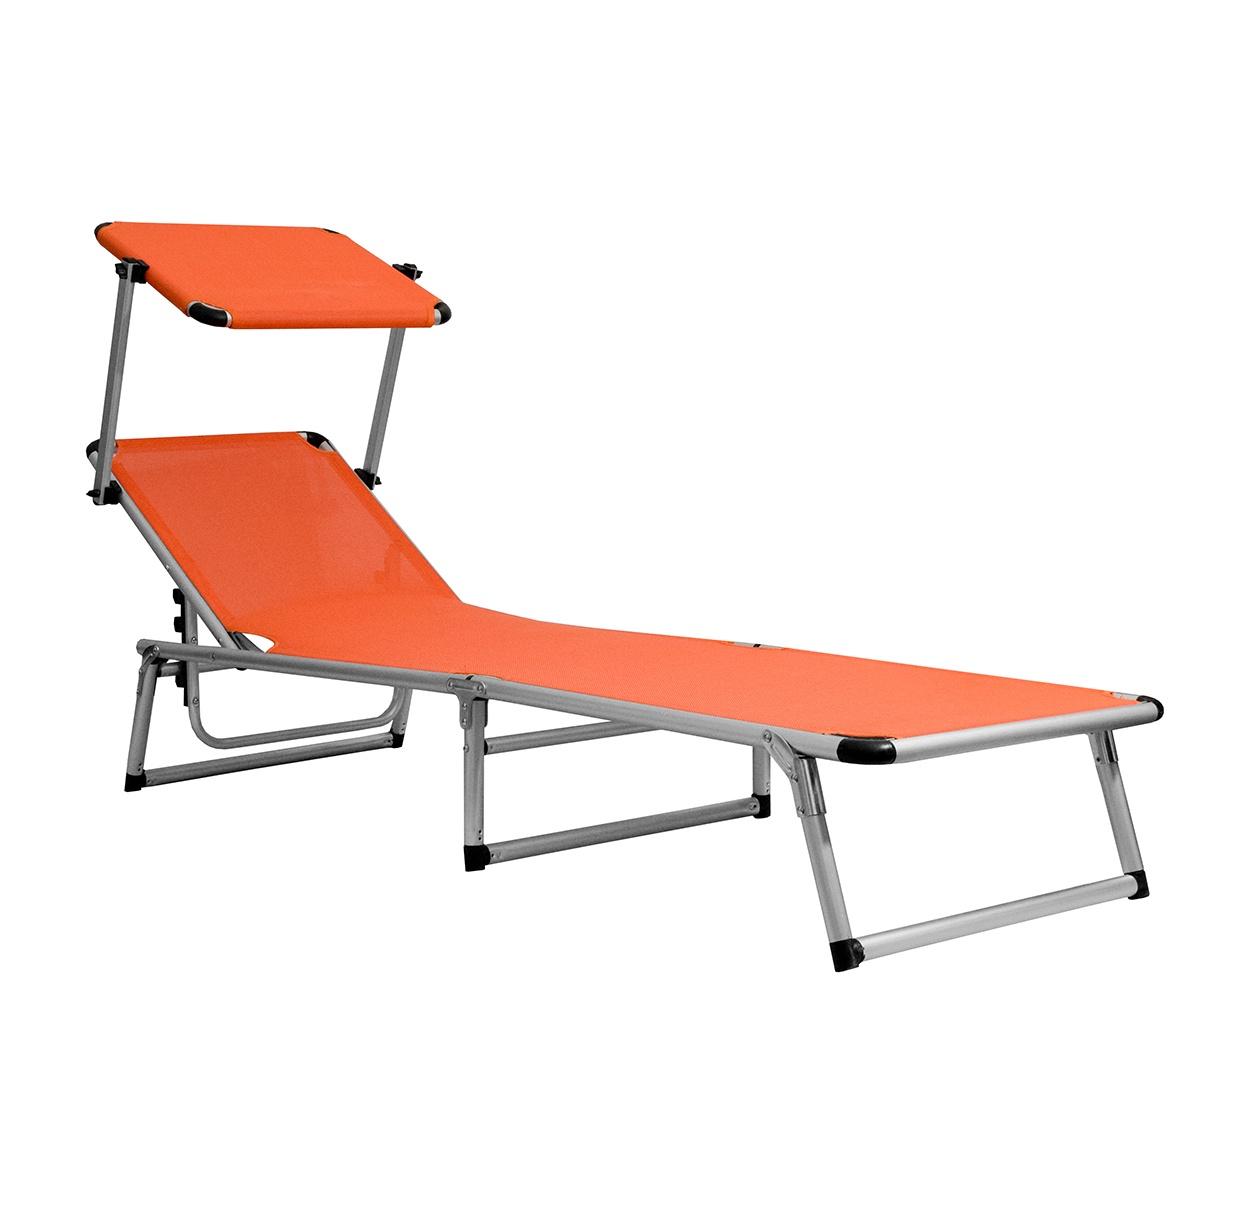 Aga Zahradní lehátko GARDEN KING MC372310O Orange